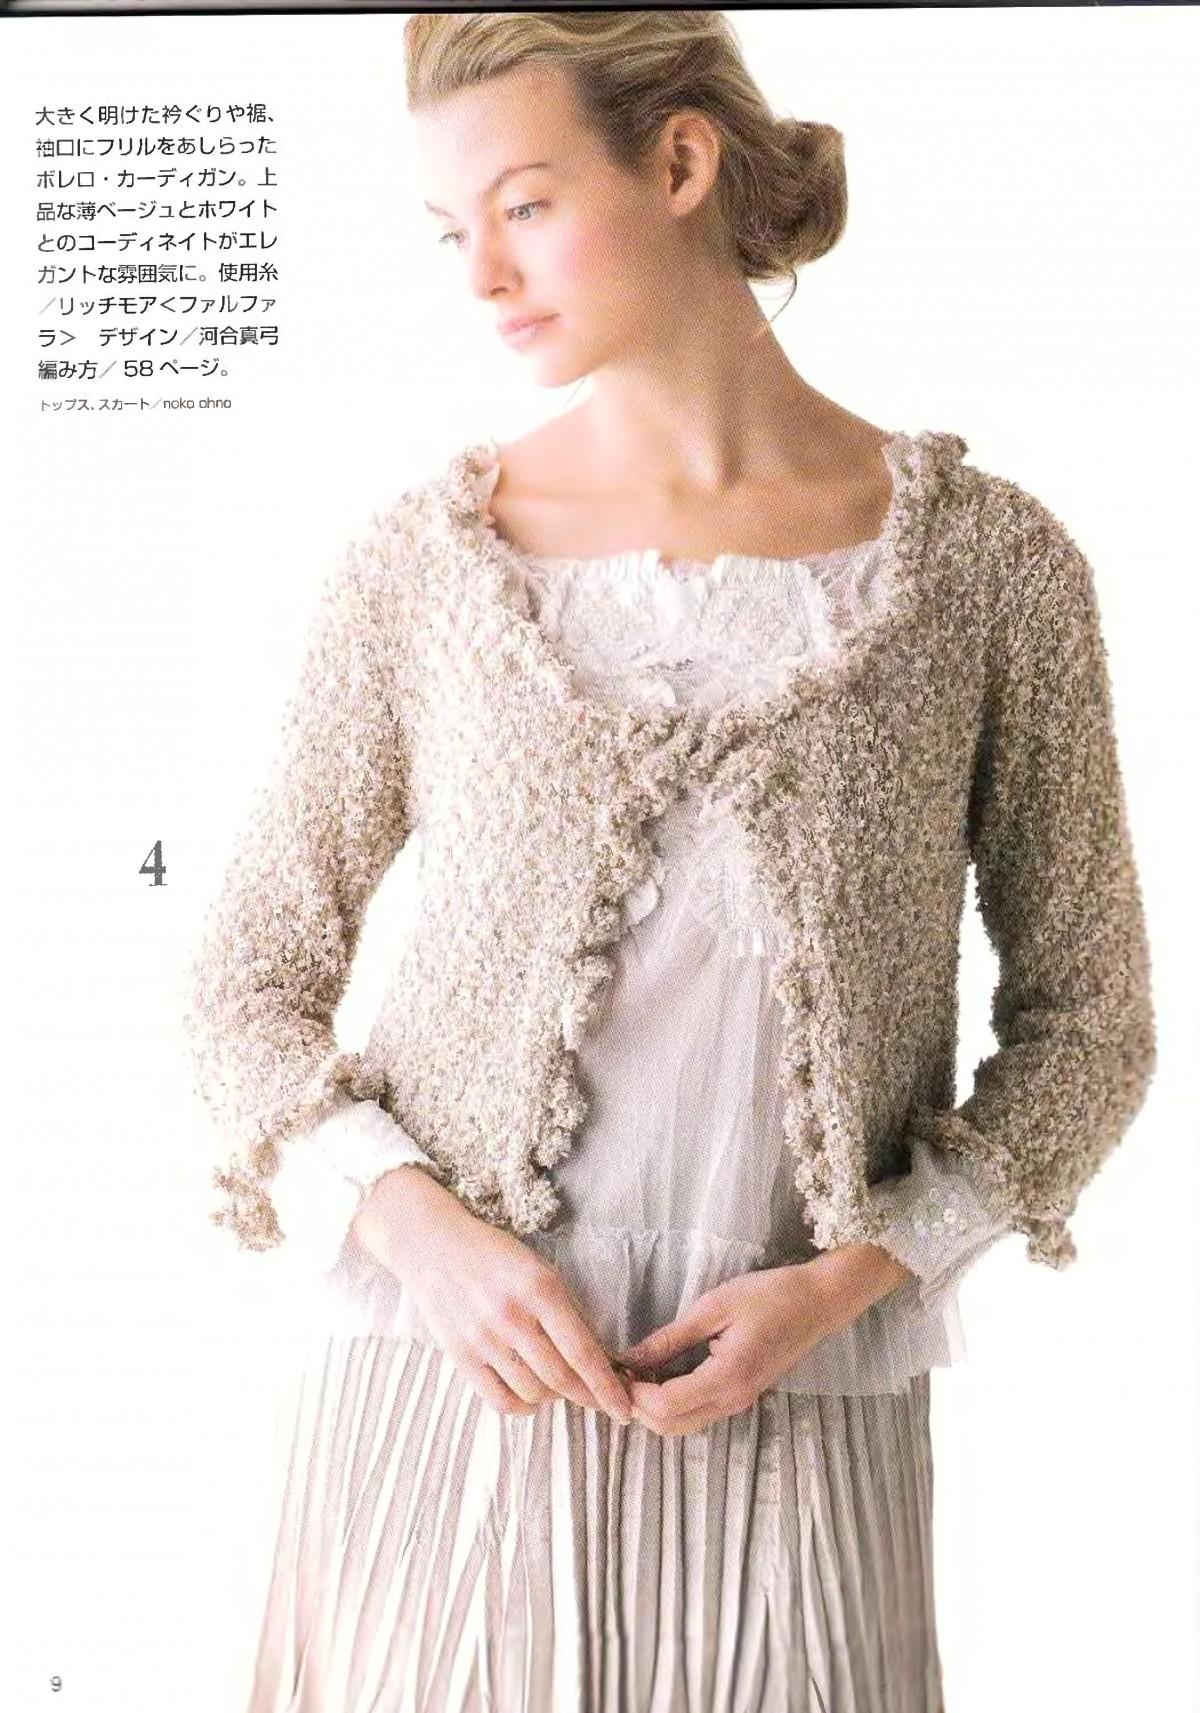 Lets-knit-series-NV4359-2008-Spring-Summer-sp-kr_7.jpg